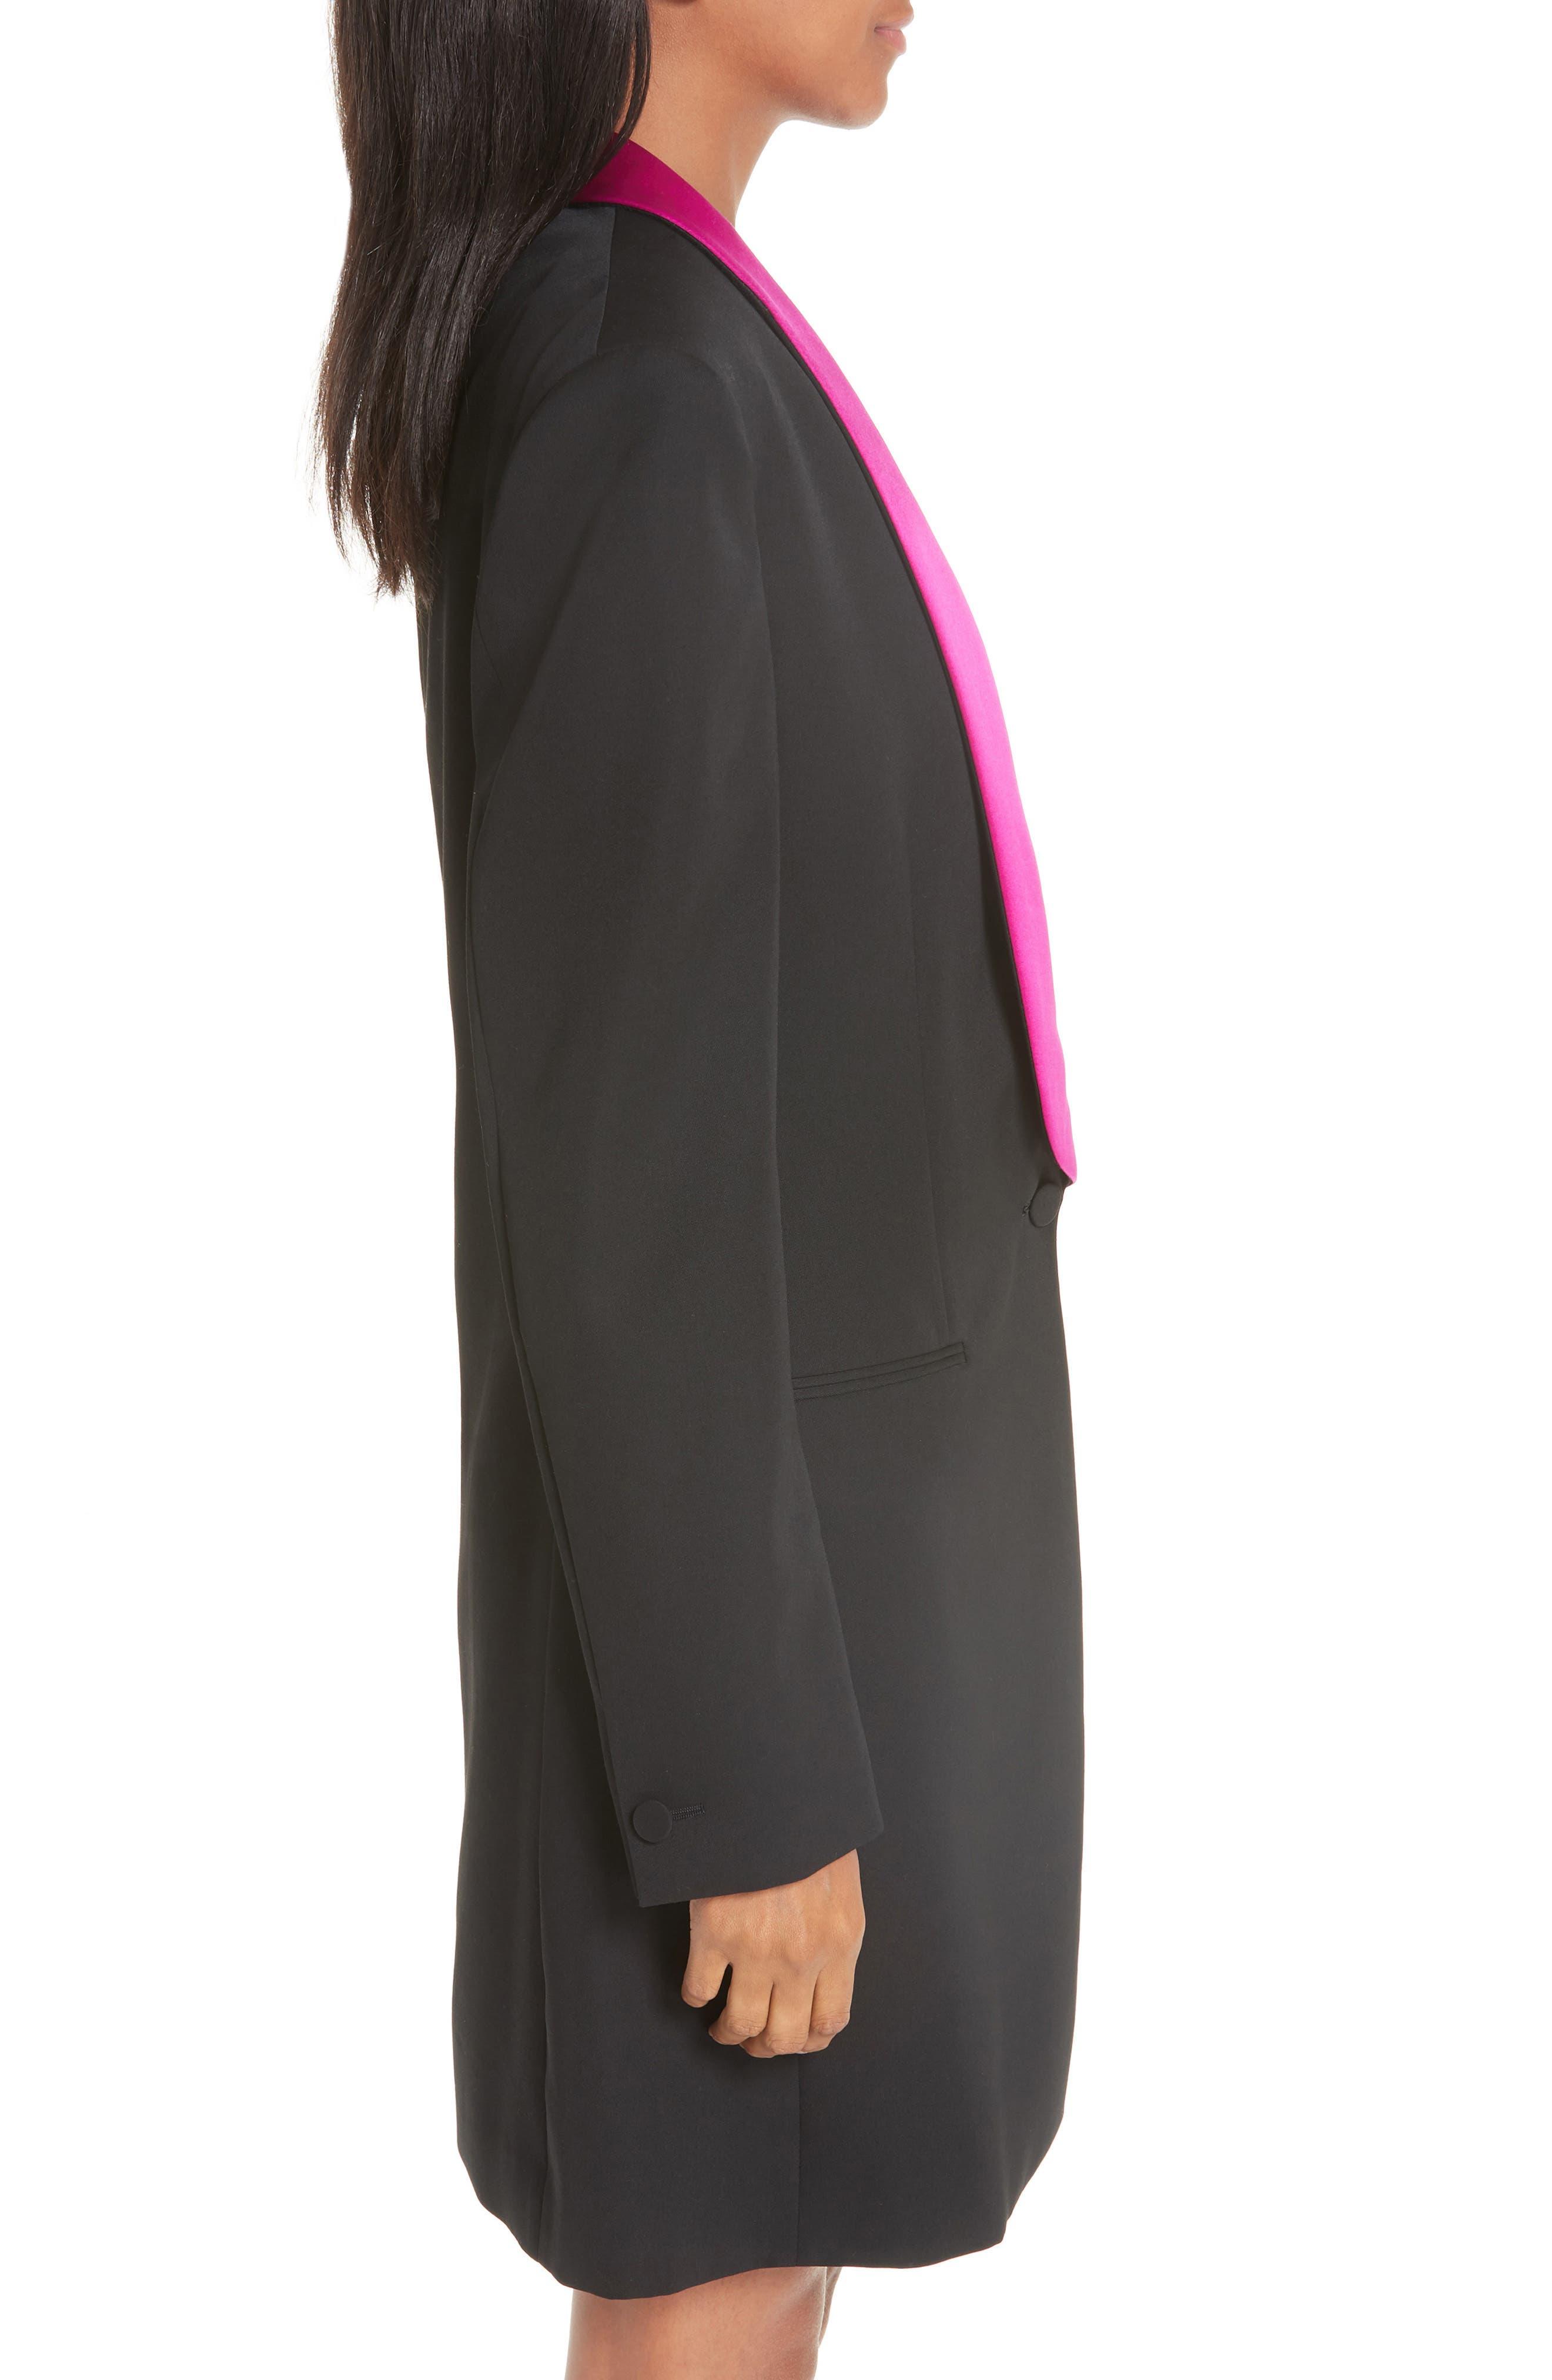 CALVIN KLEIN 205W39NYC, Contrast Lapel Wool Gabardine Jacket, Alternate thumbnail 4, color, BLACK DARK ORCHID